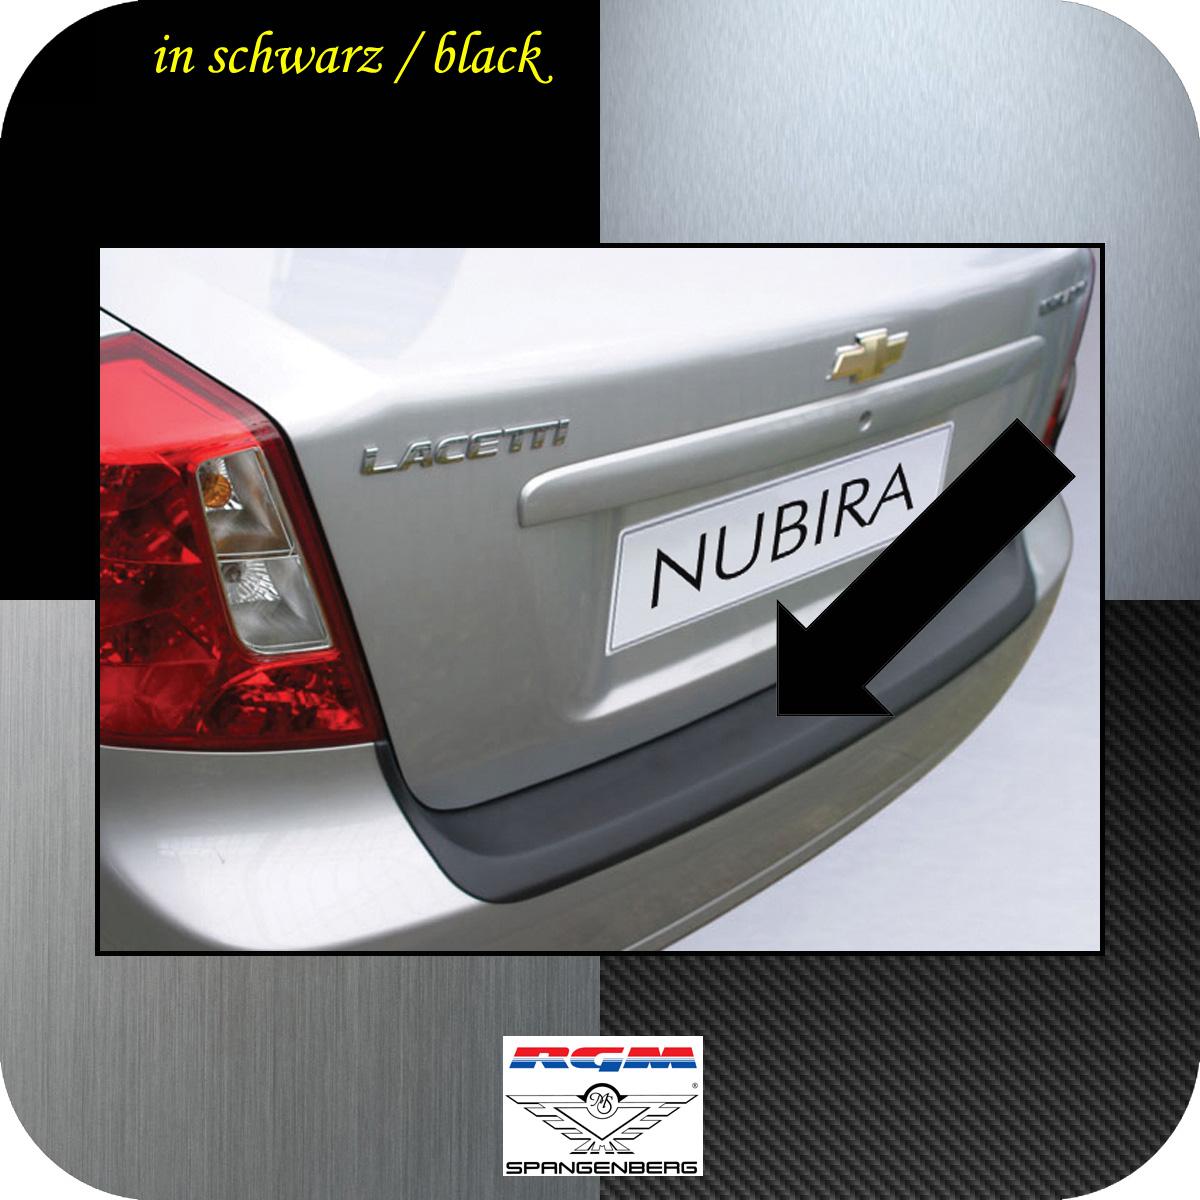 Ladekantenschutz schwarz Chevrolet Lacetti Nubira Limousine ab 2005- 3500324